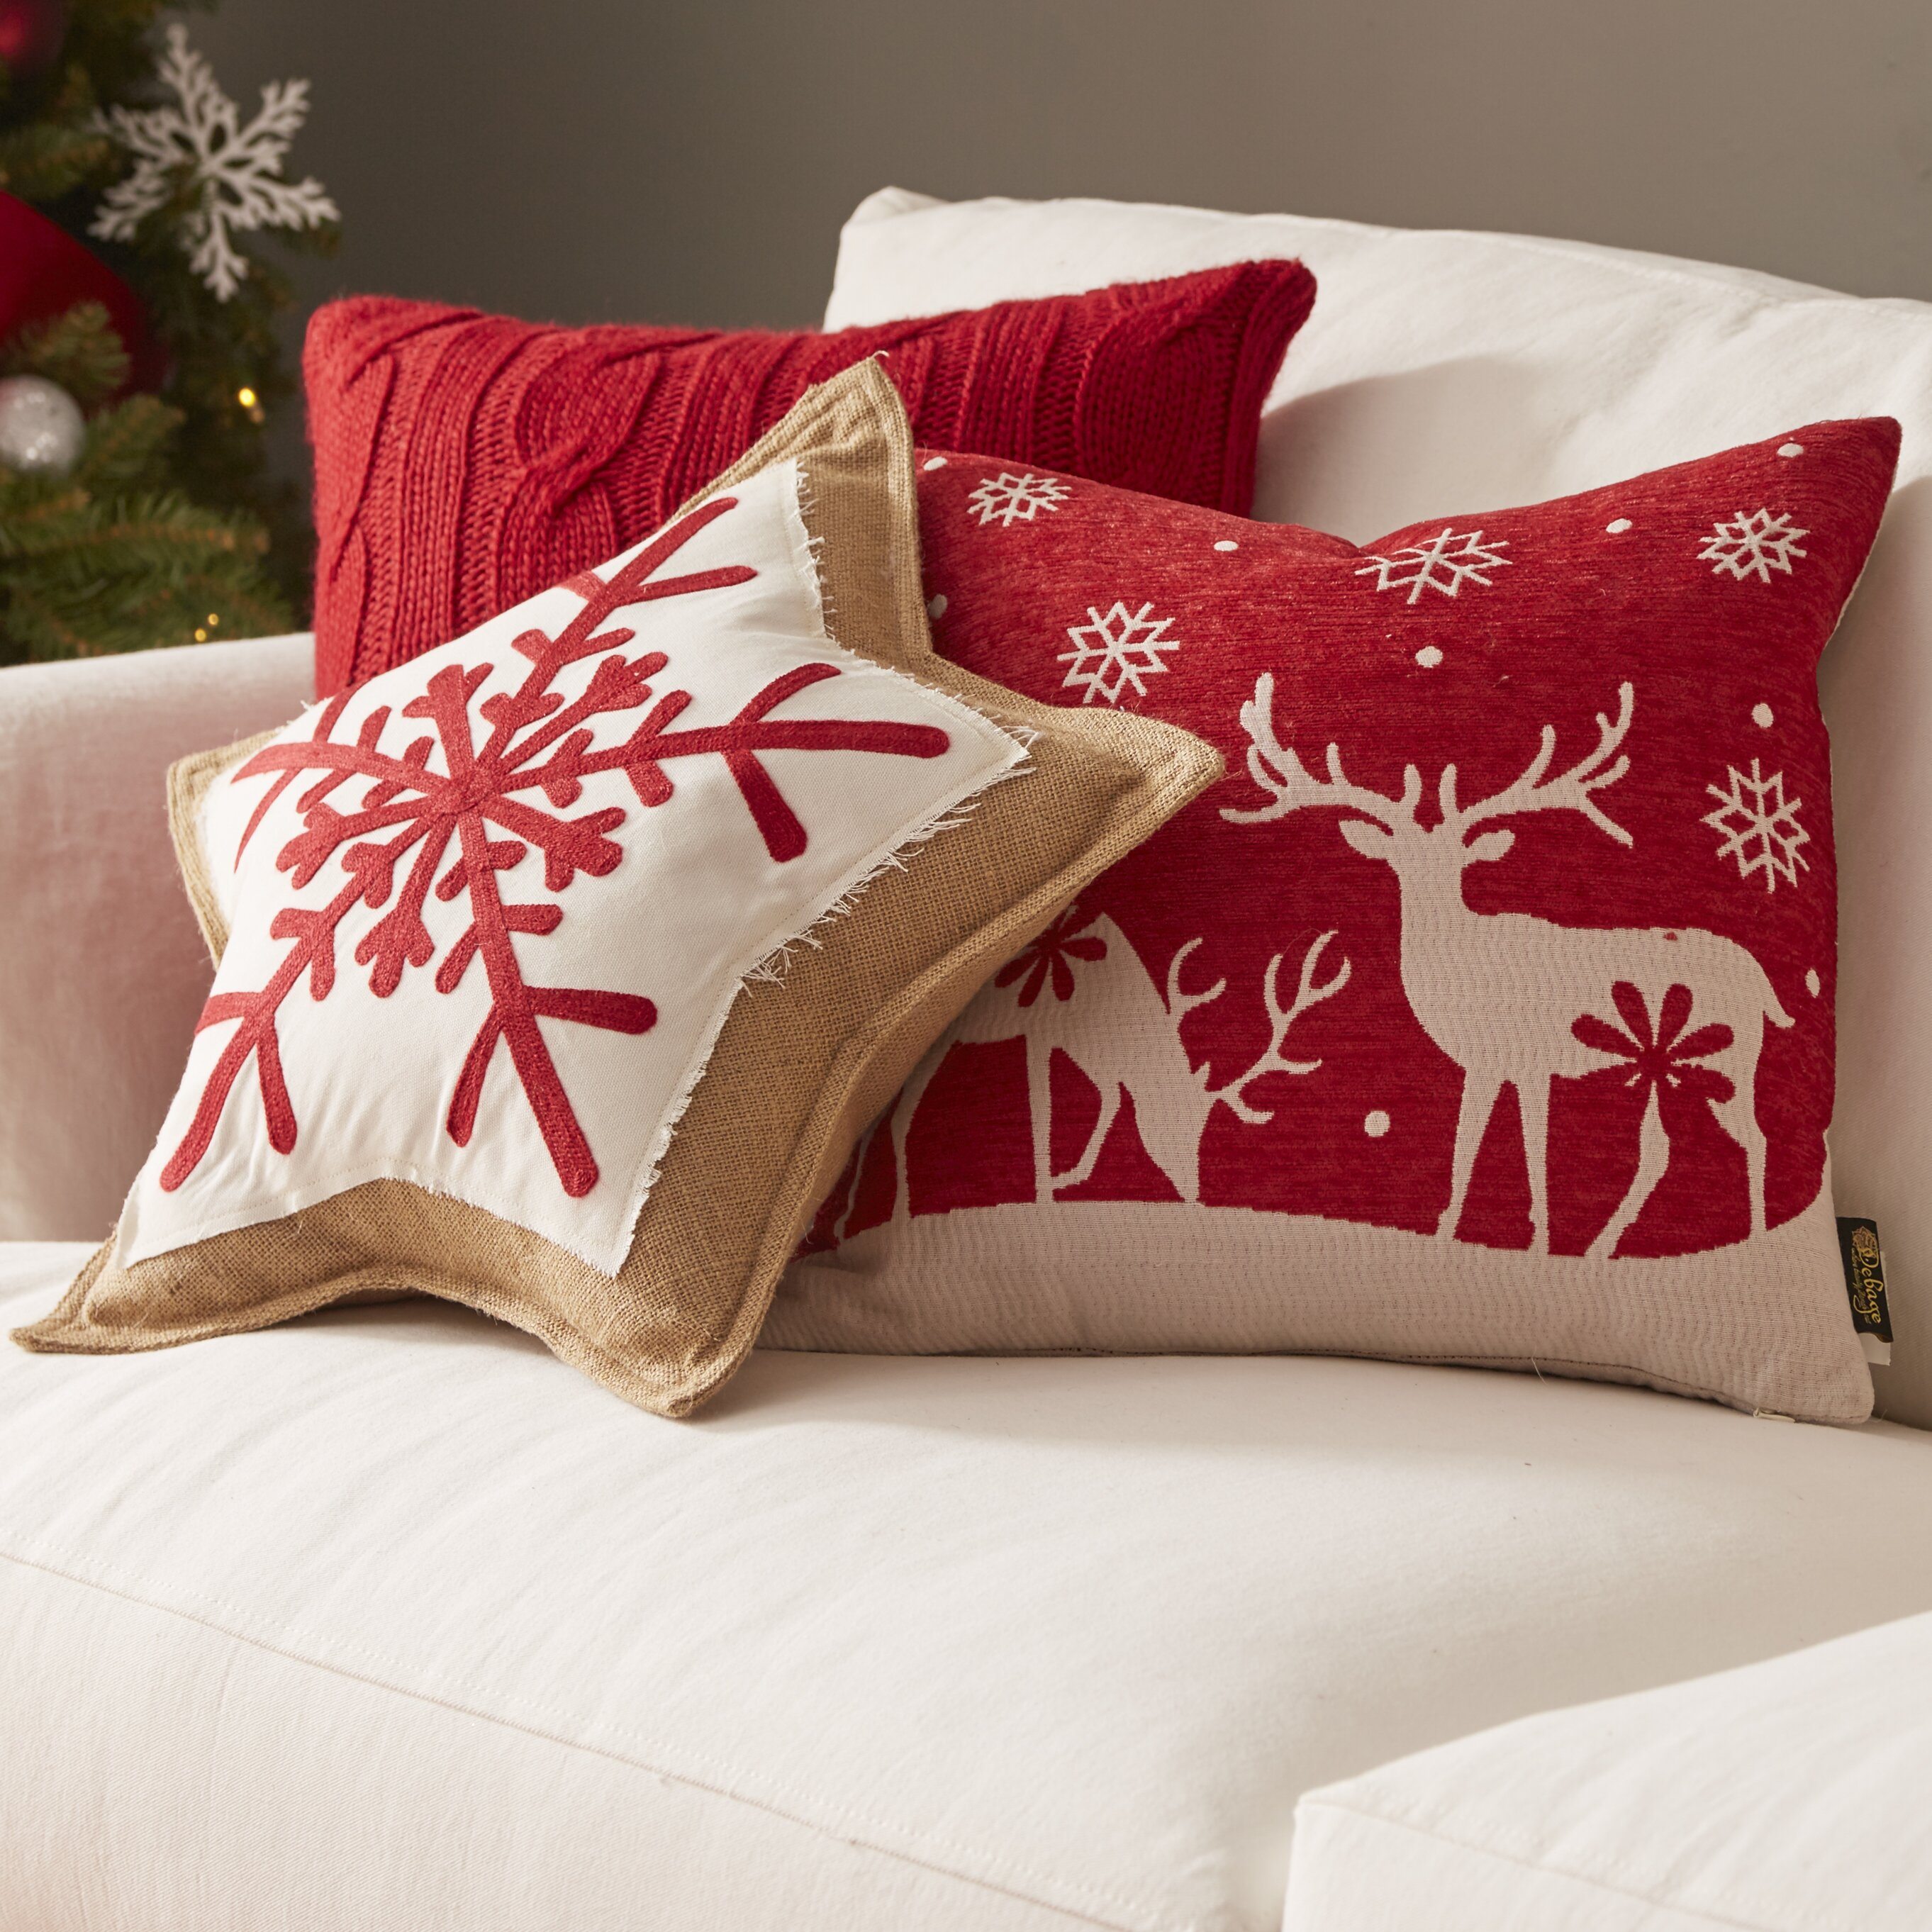 Jute Throw Pillow : Safavieh Snowflake Cookie Jute Throw Pillow & Reviews Wayfair